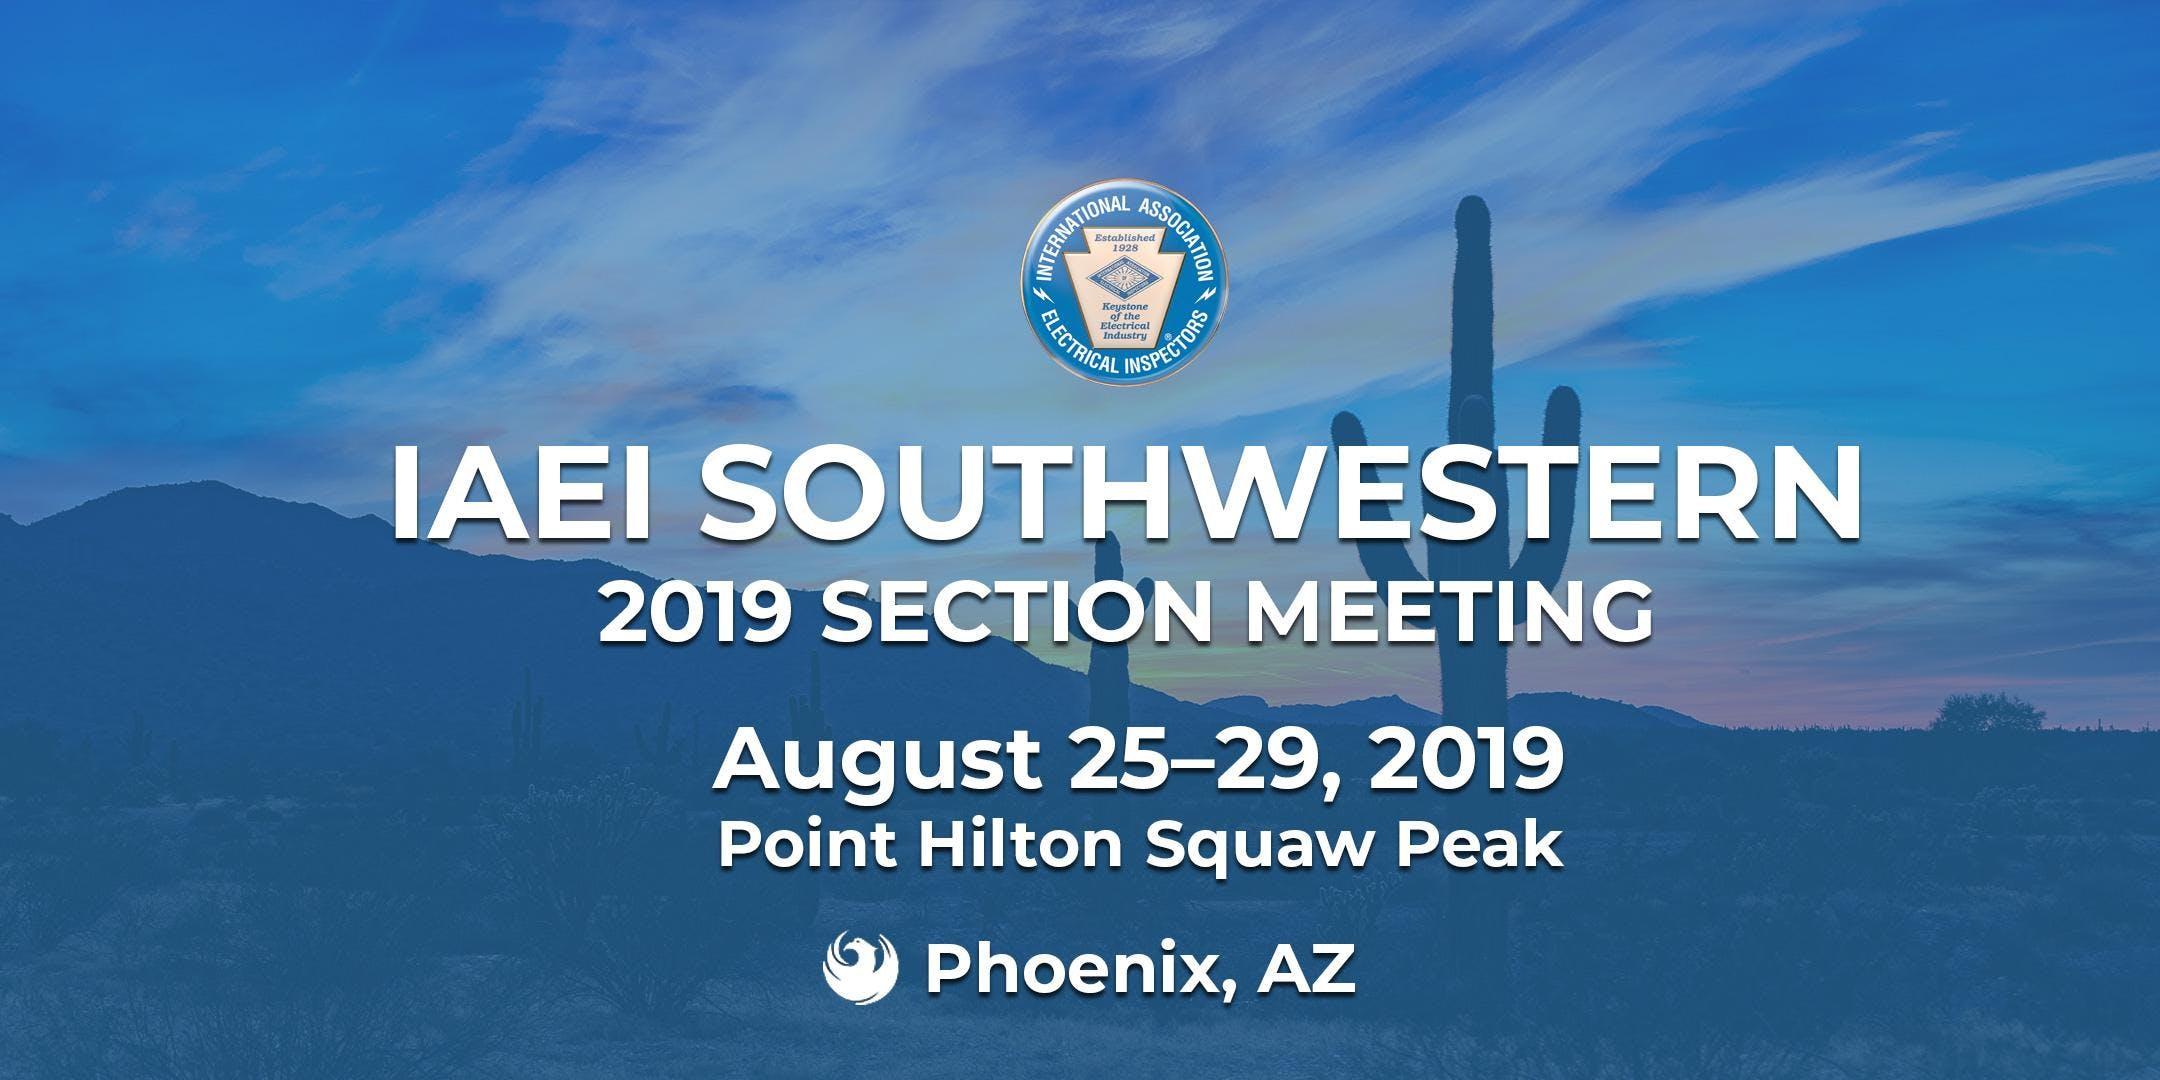 IAEI Southwestern 2019 Annual Section Meeting